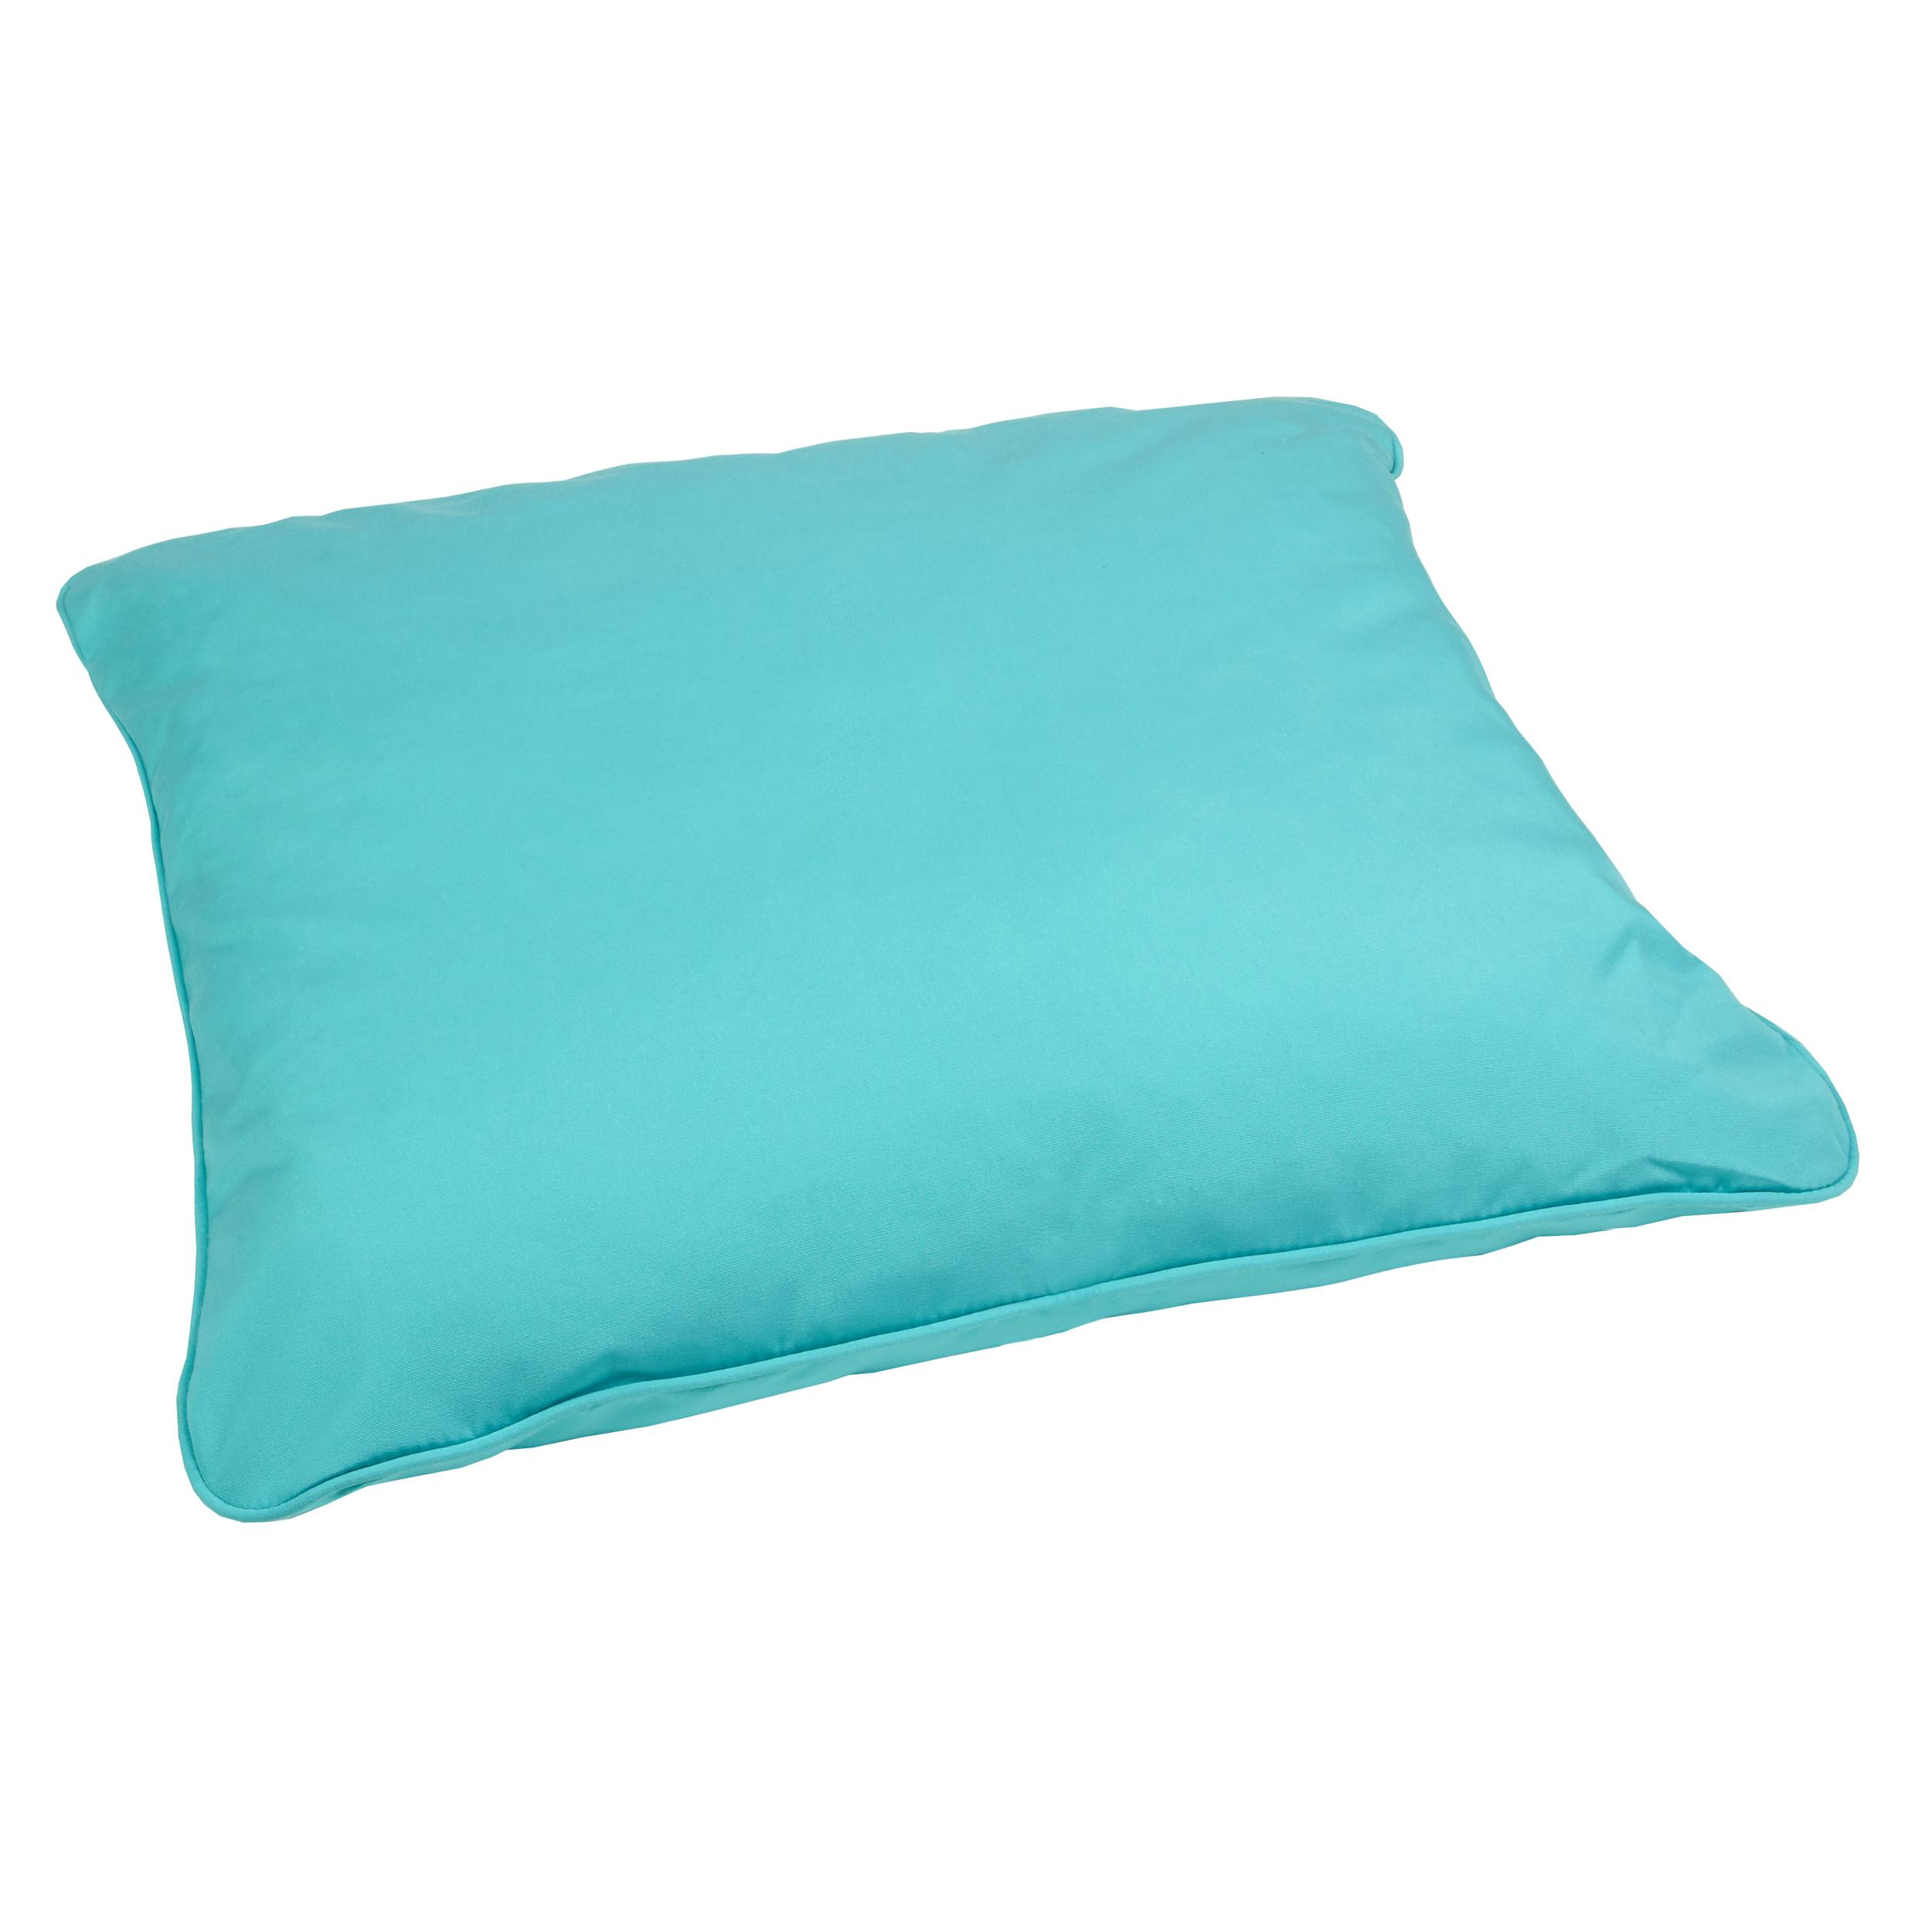 Amazon.com : Mozaic Corded Indoor/Outdoor Square Floor Pillow, 28-Inch, Aruba Blue : Patio, Lawn ...